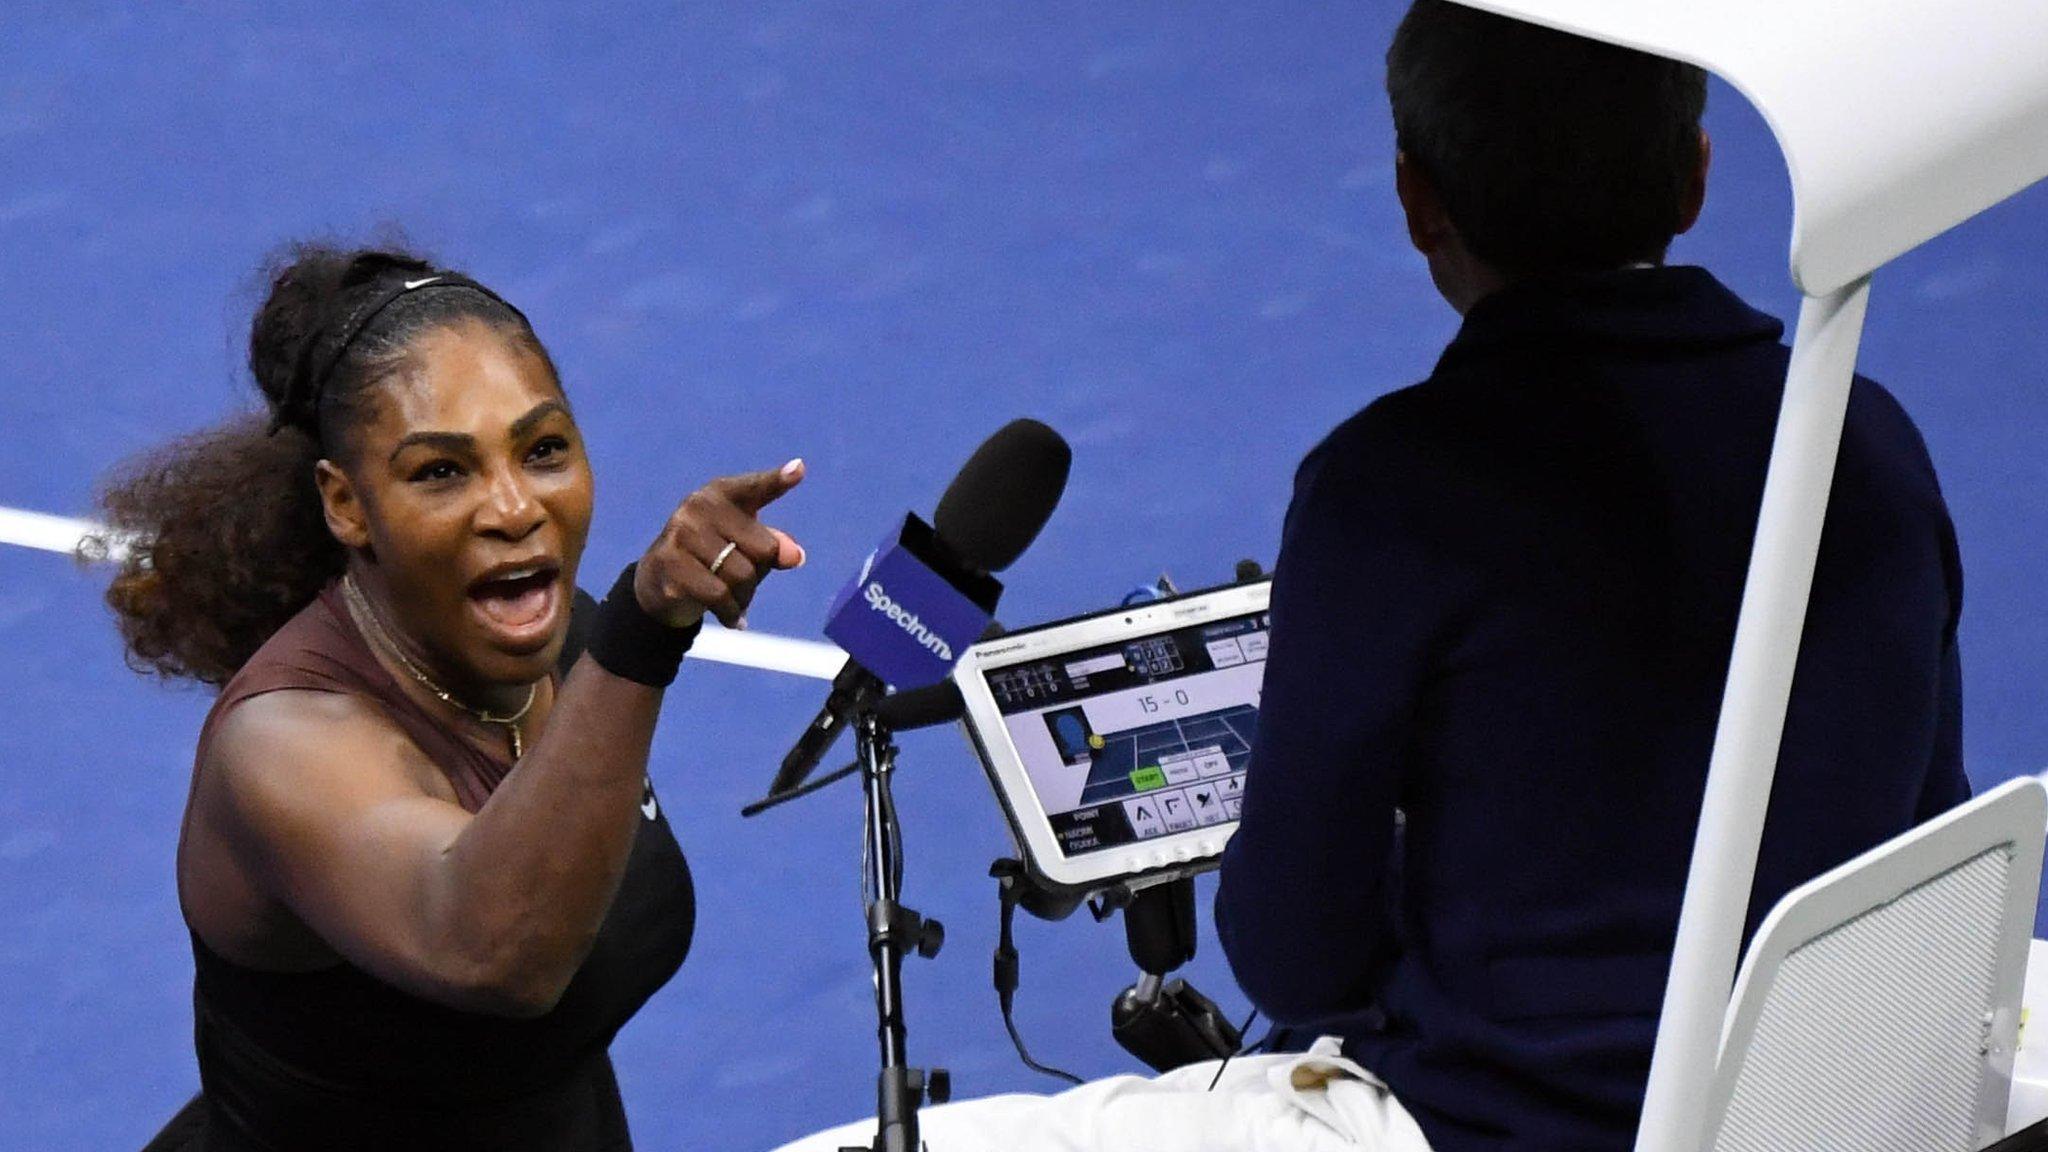 Williams accuses finals umpire of sexism